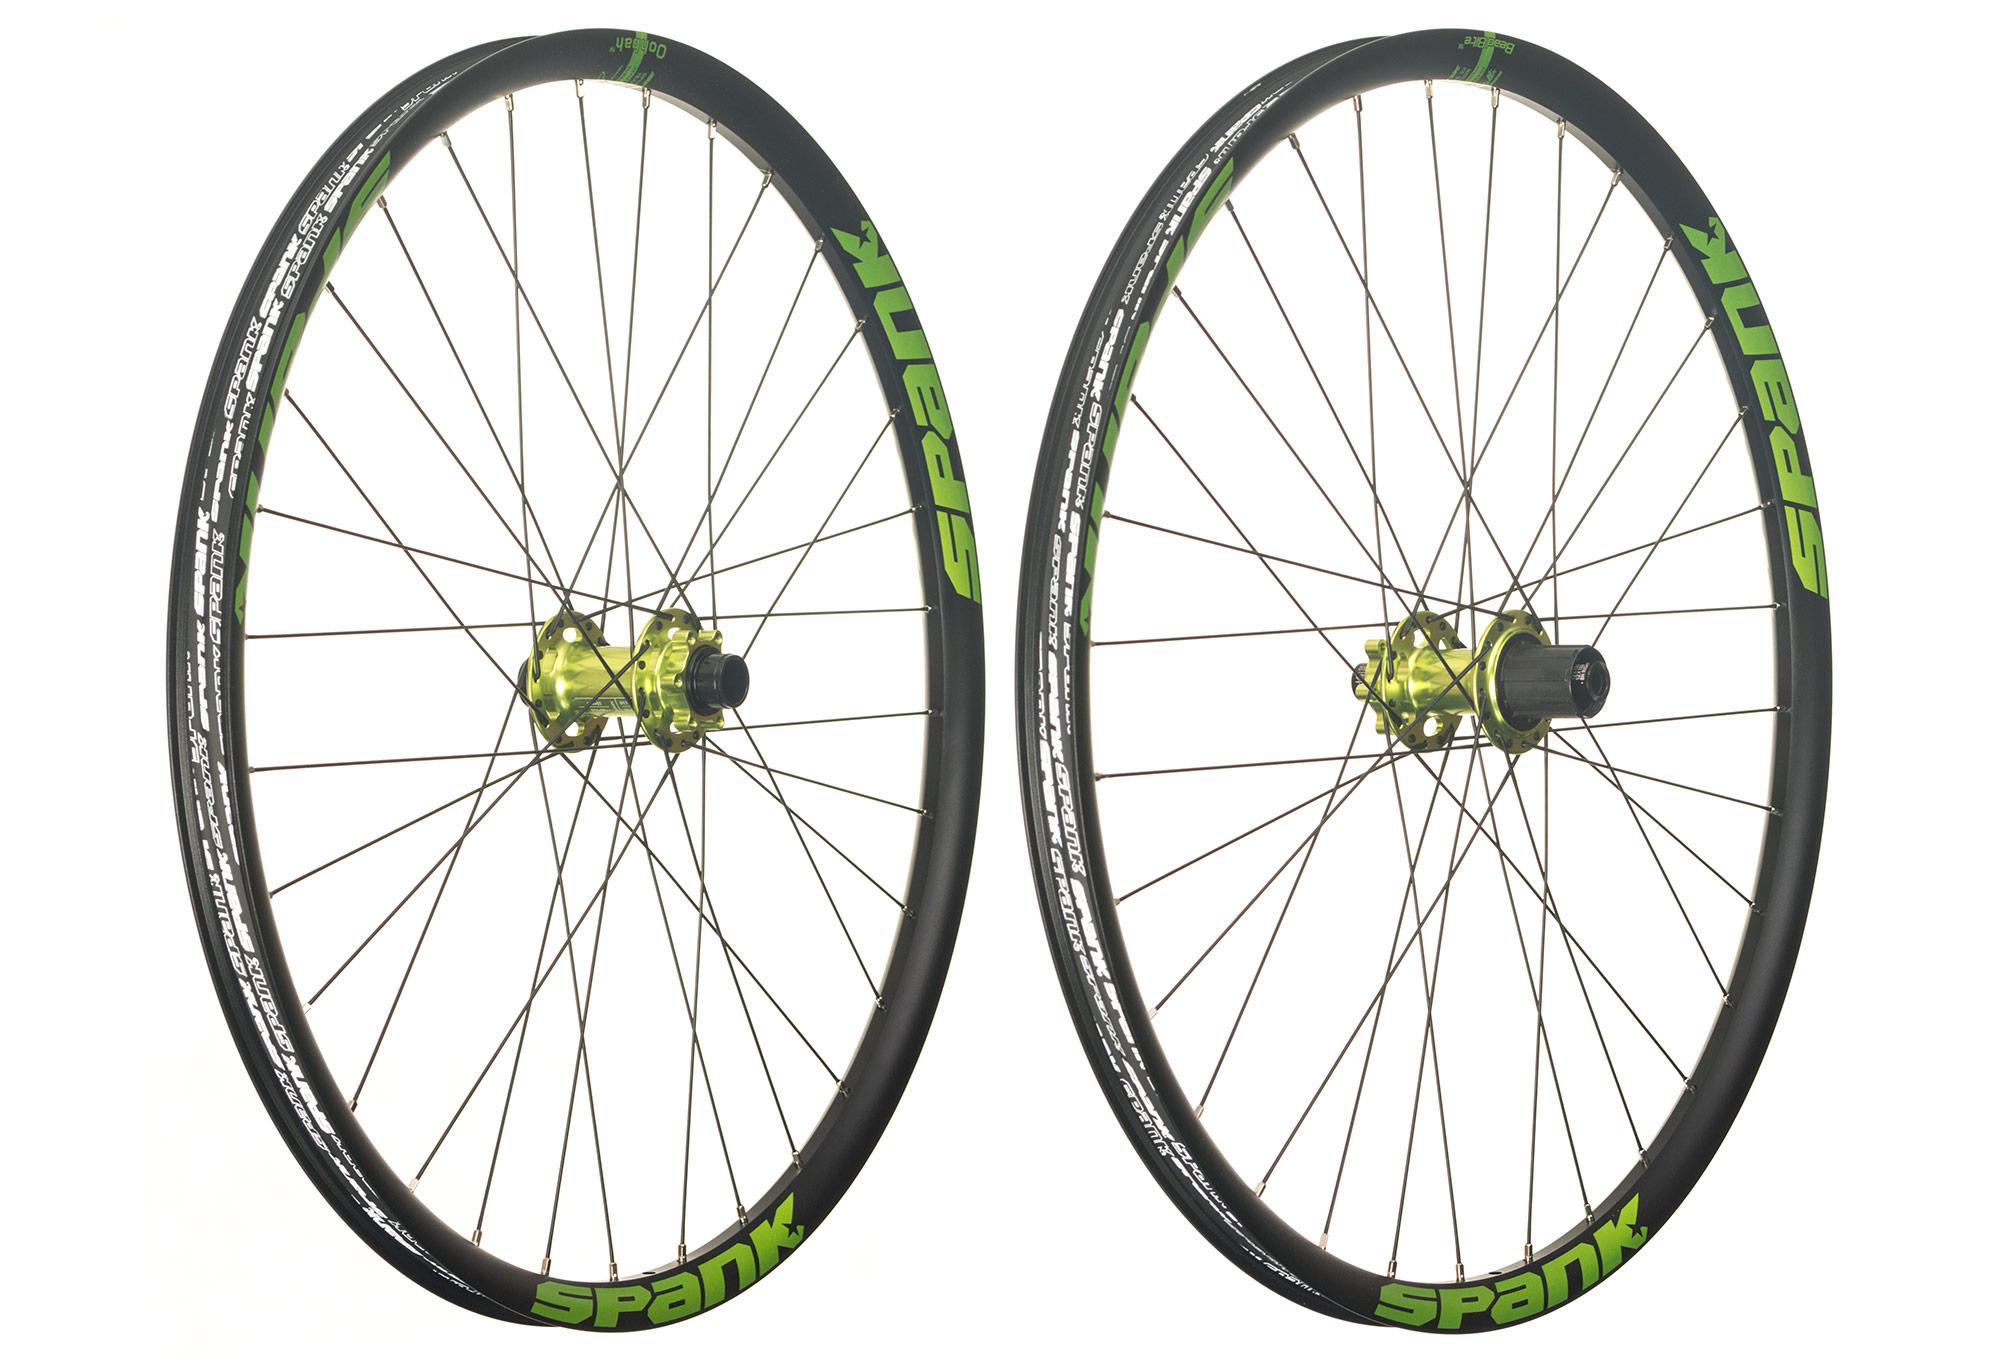 Spank rims wheel set valuable